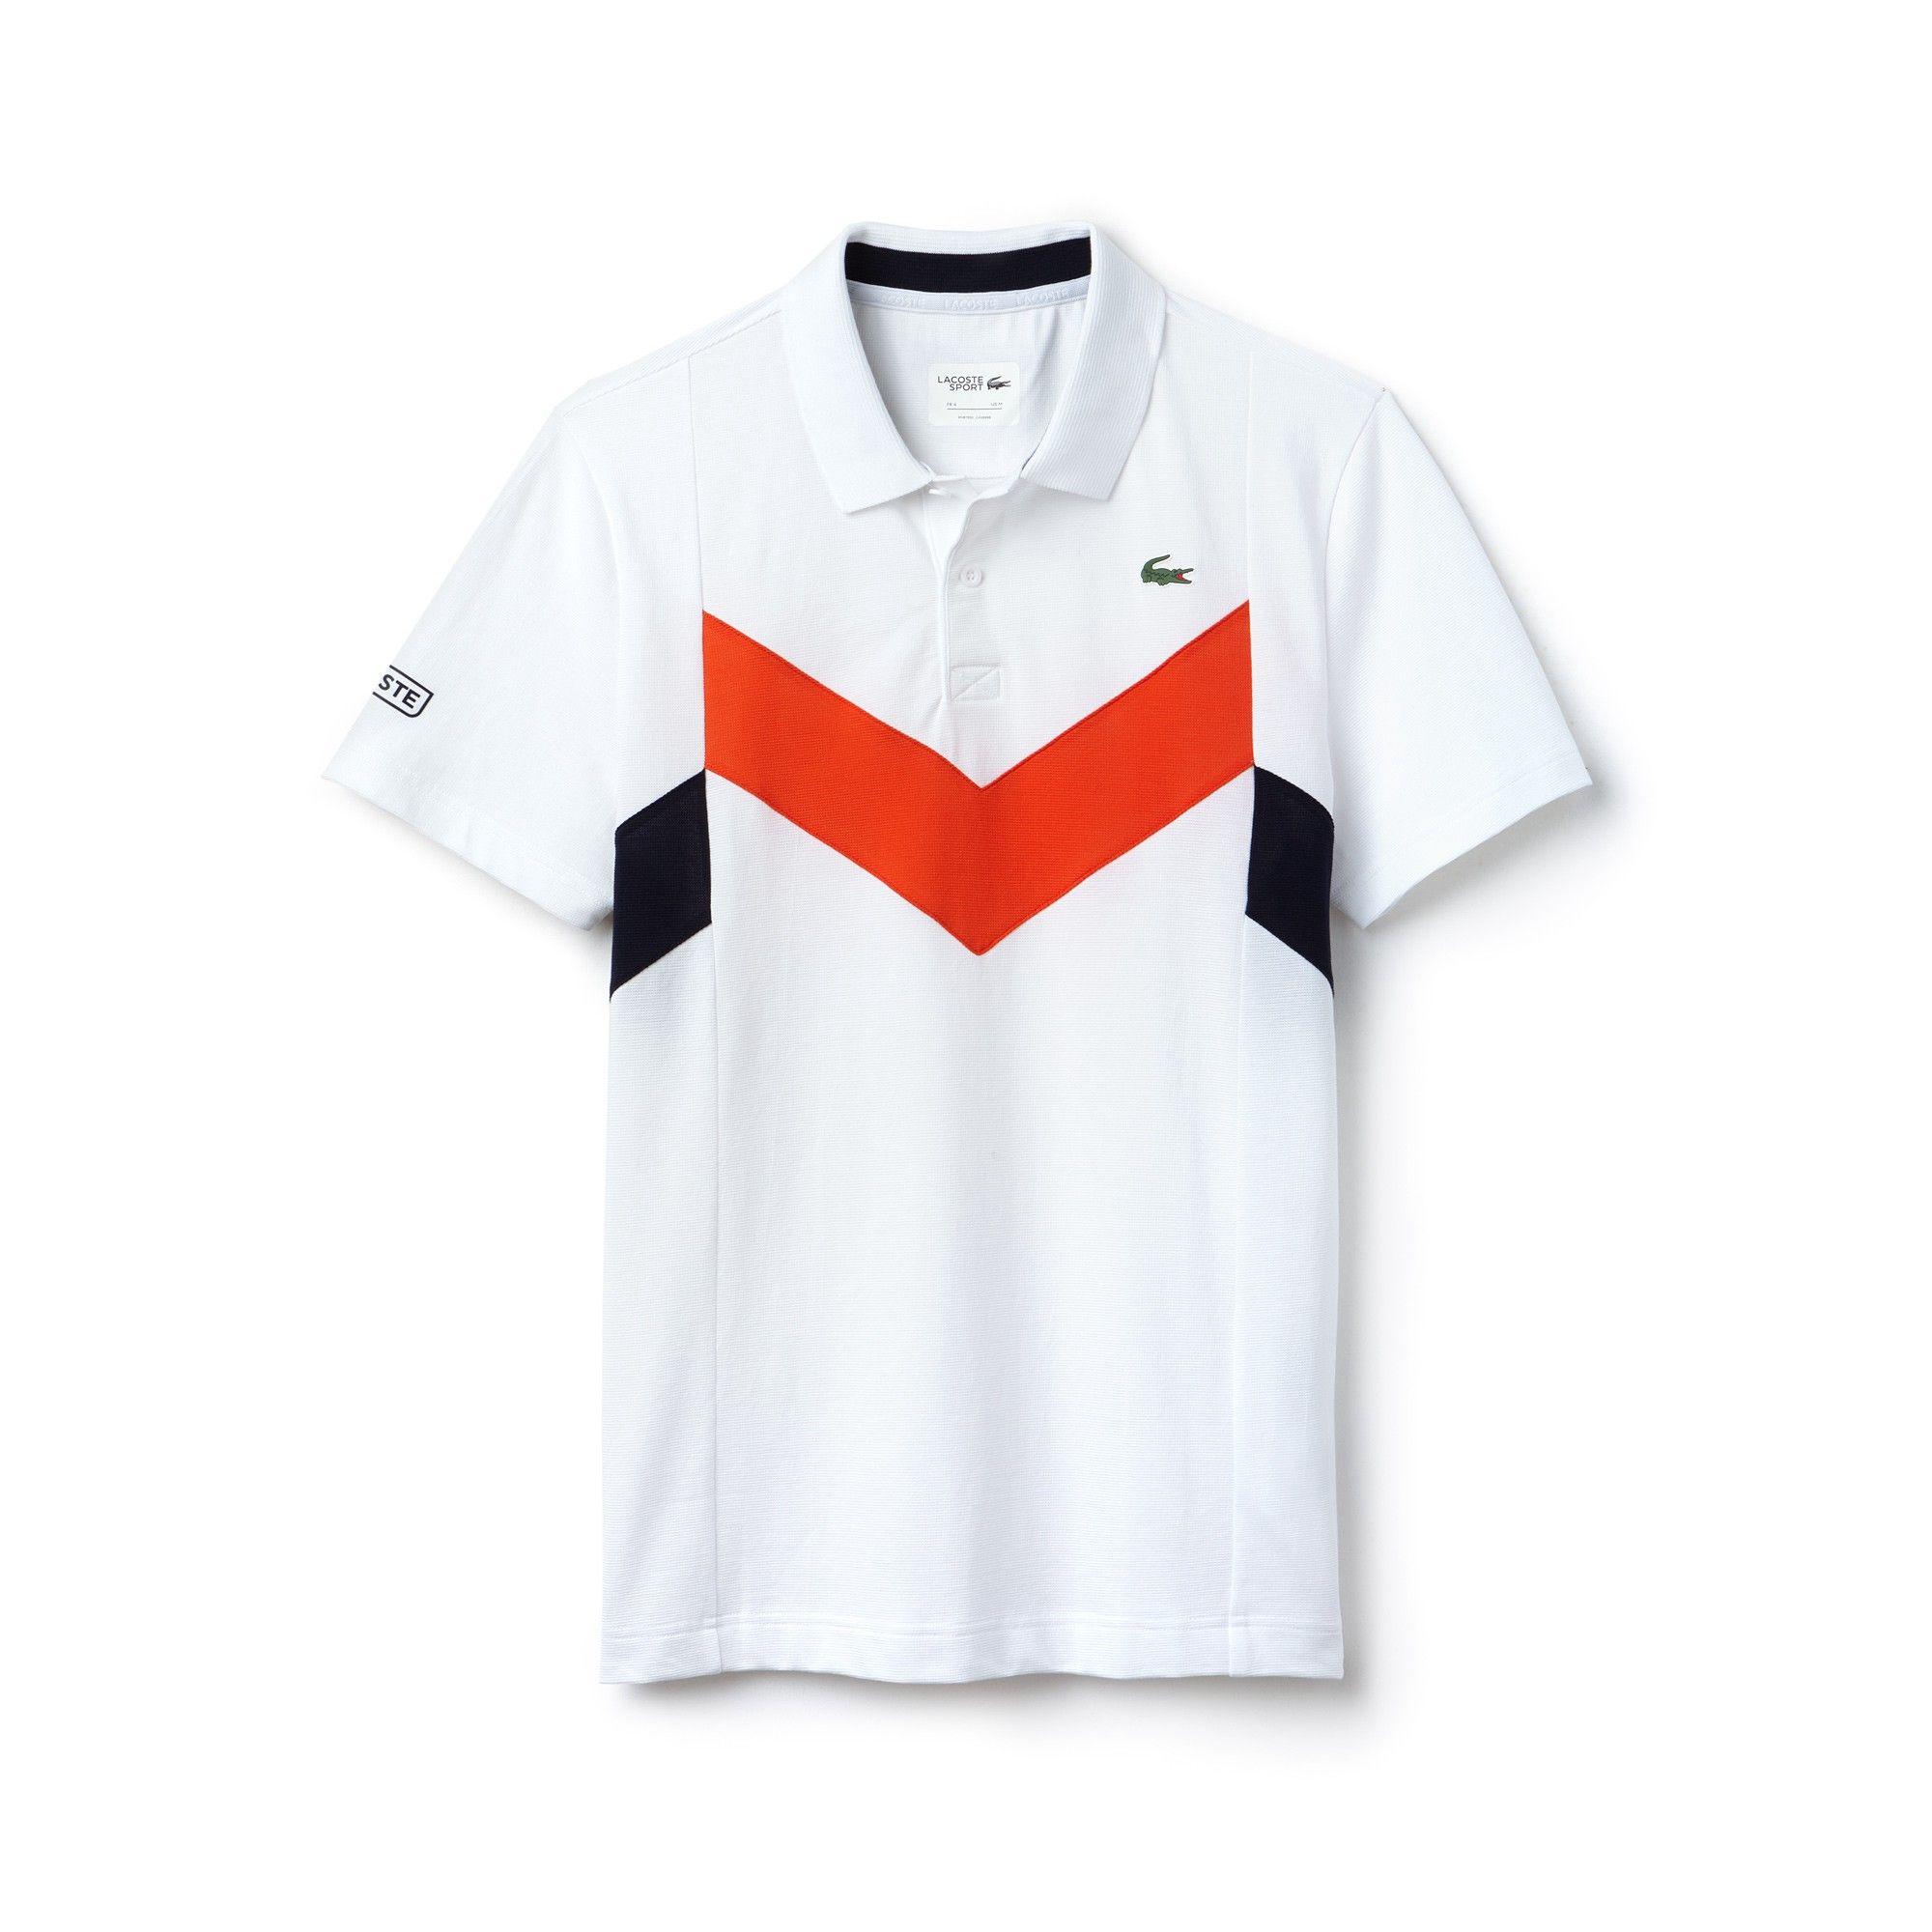 974fc9937ec4 Lacoste Men s Sport Tennis Ultra-Lightweight Colorblock Knit Polo -  White Mexico Red-Navy Blu 4XL